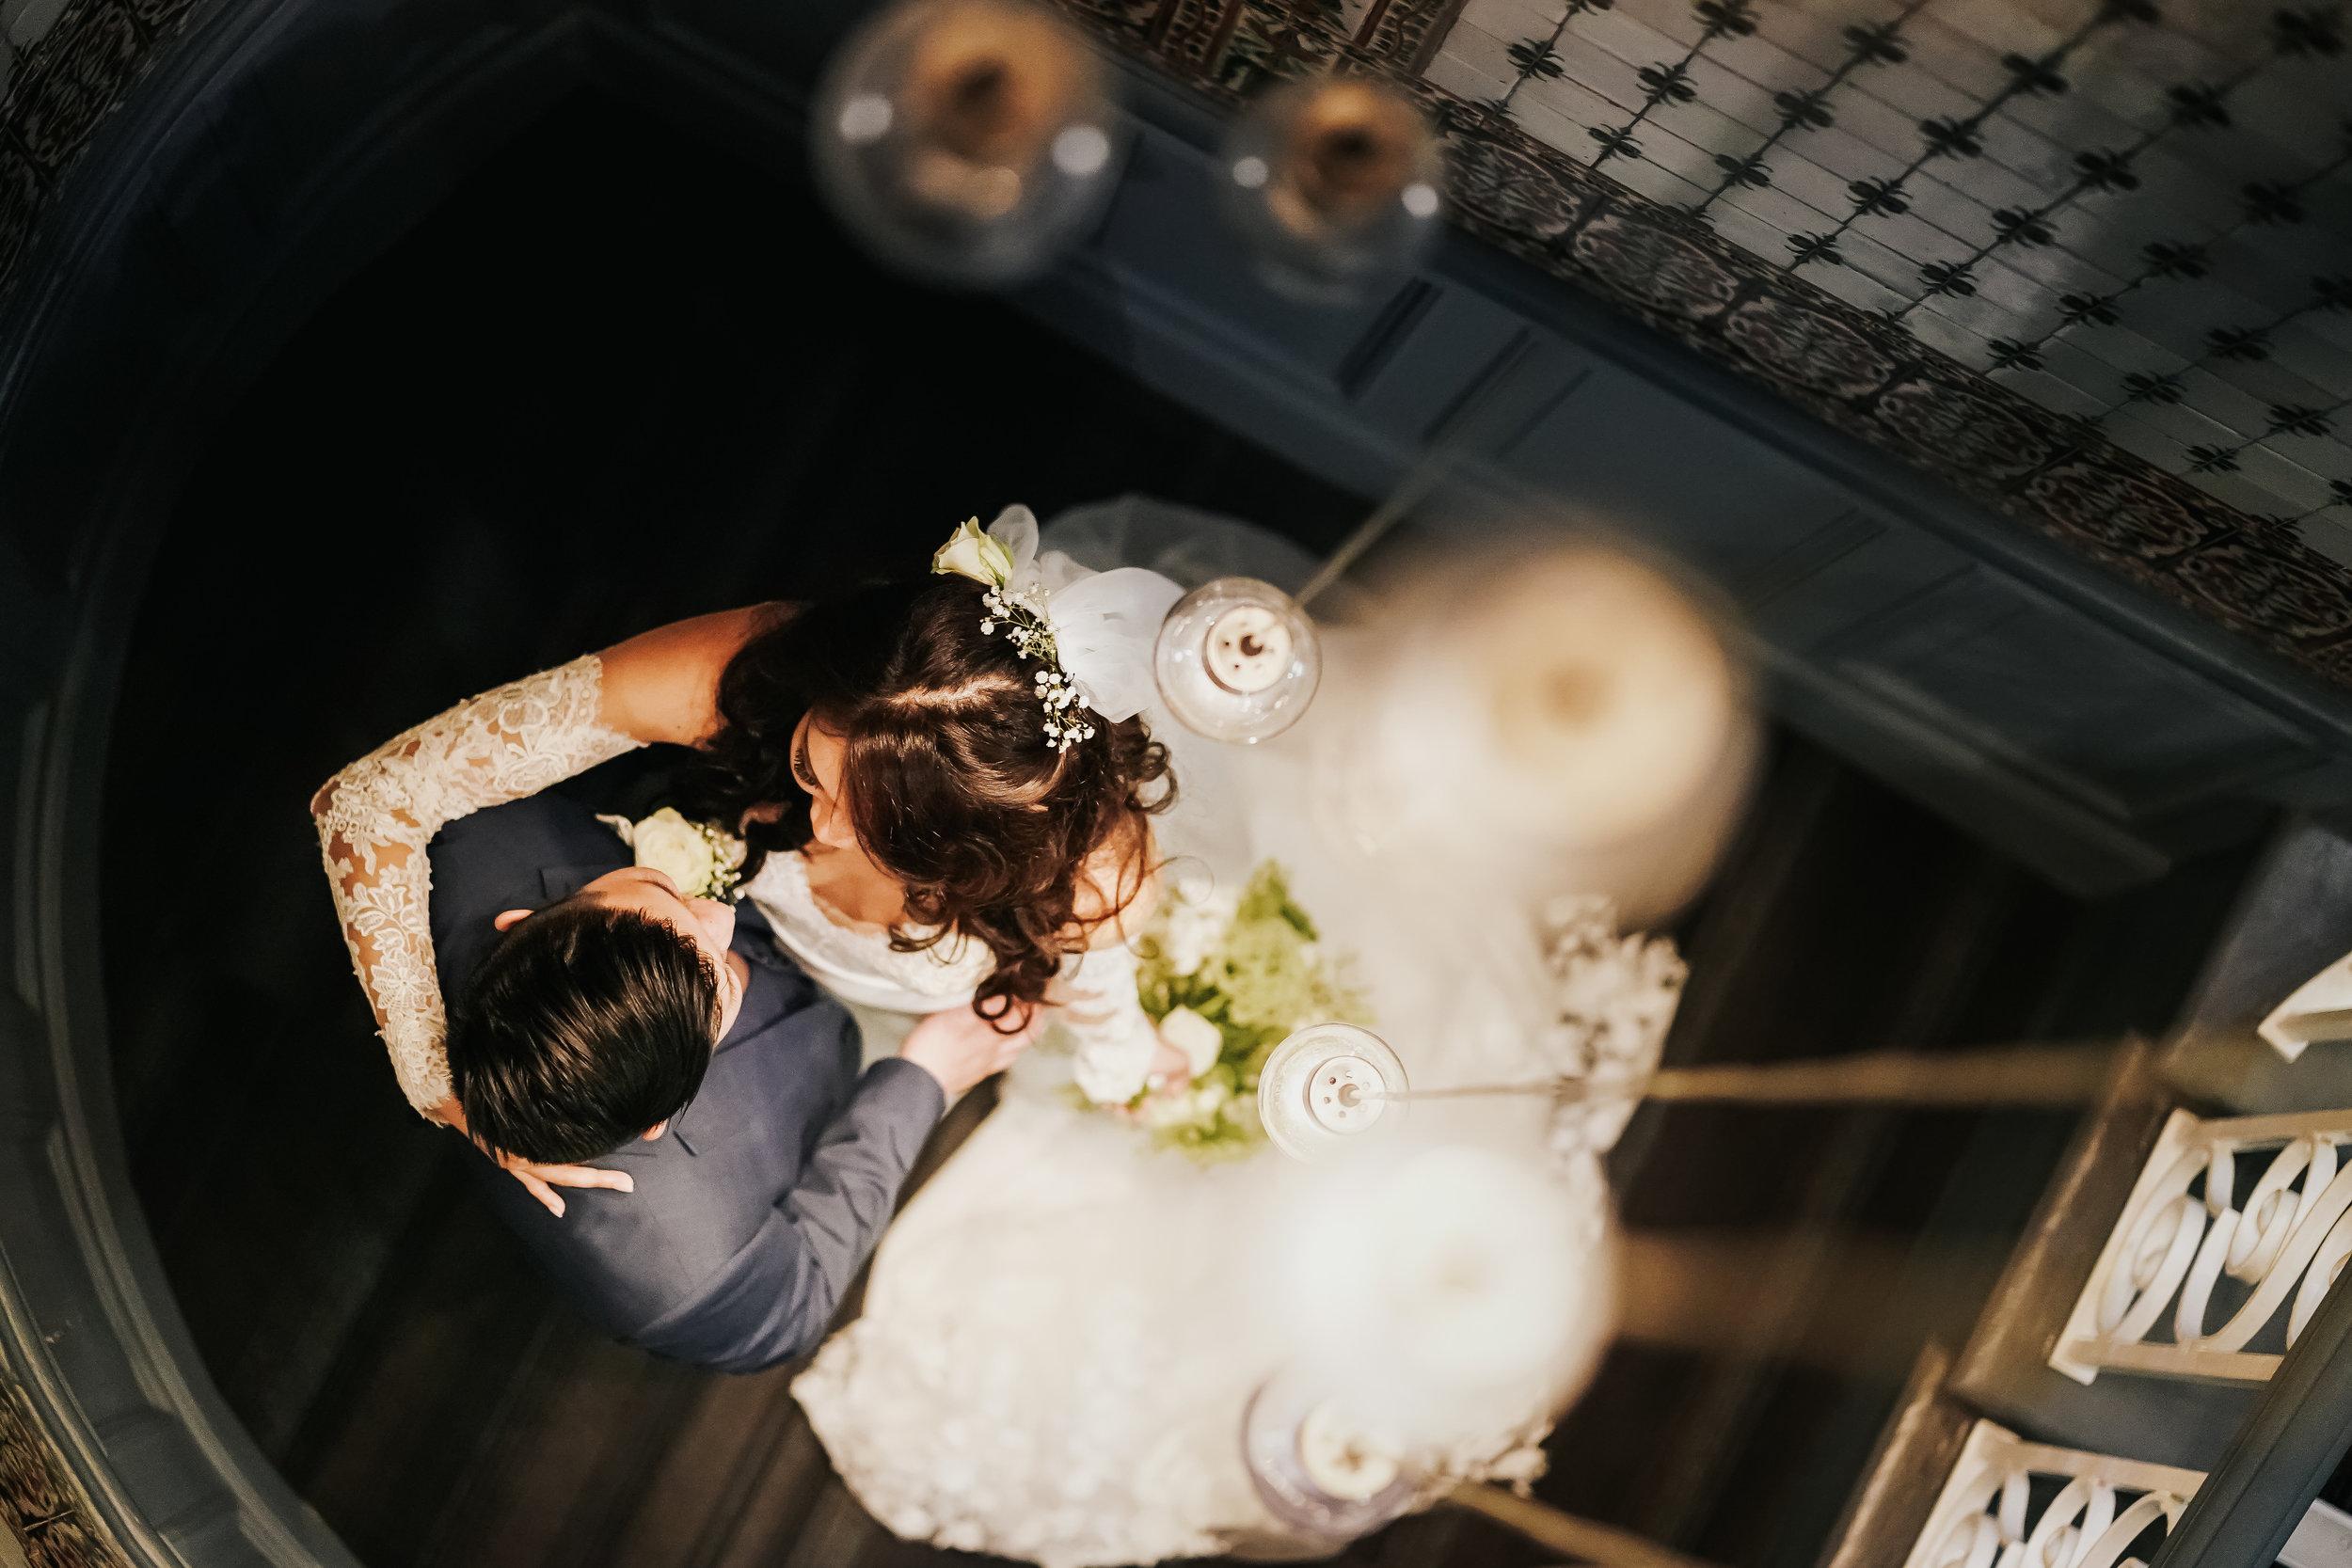 Chinese Wedding Photography Manchester wedding photographer Cheshire - 026.jpg